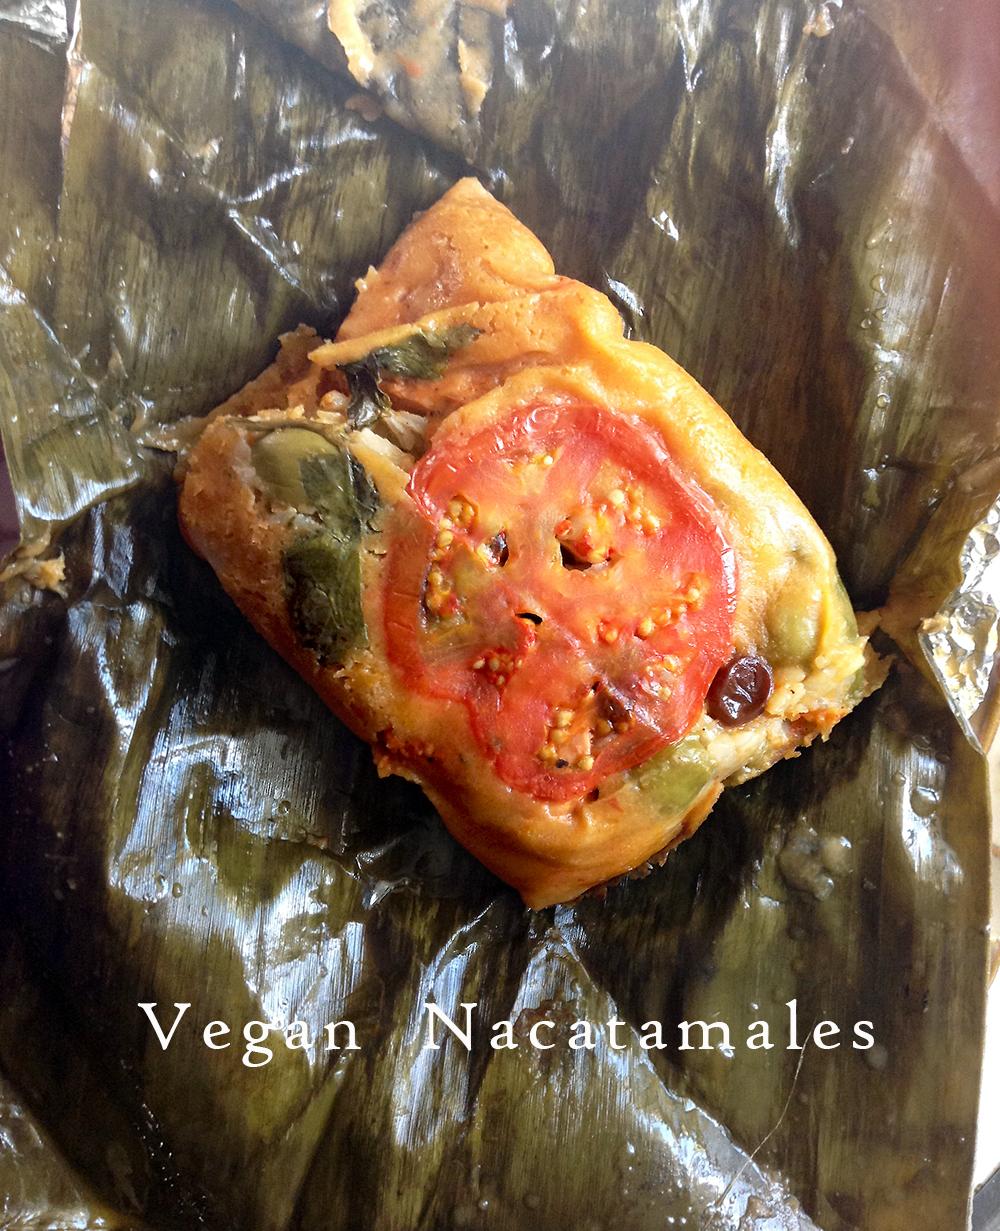 Vegan Nacatamales (Nicaraguan Steamed Corn Cakes)